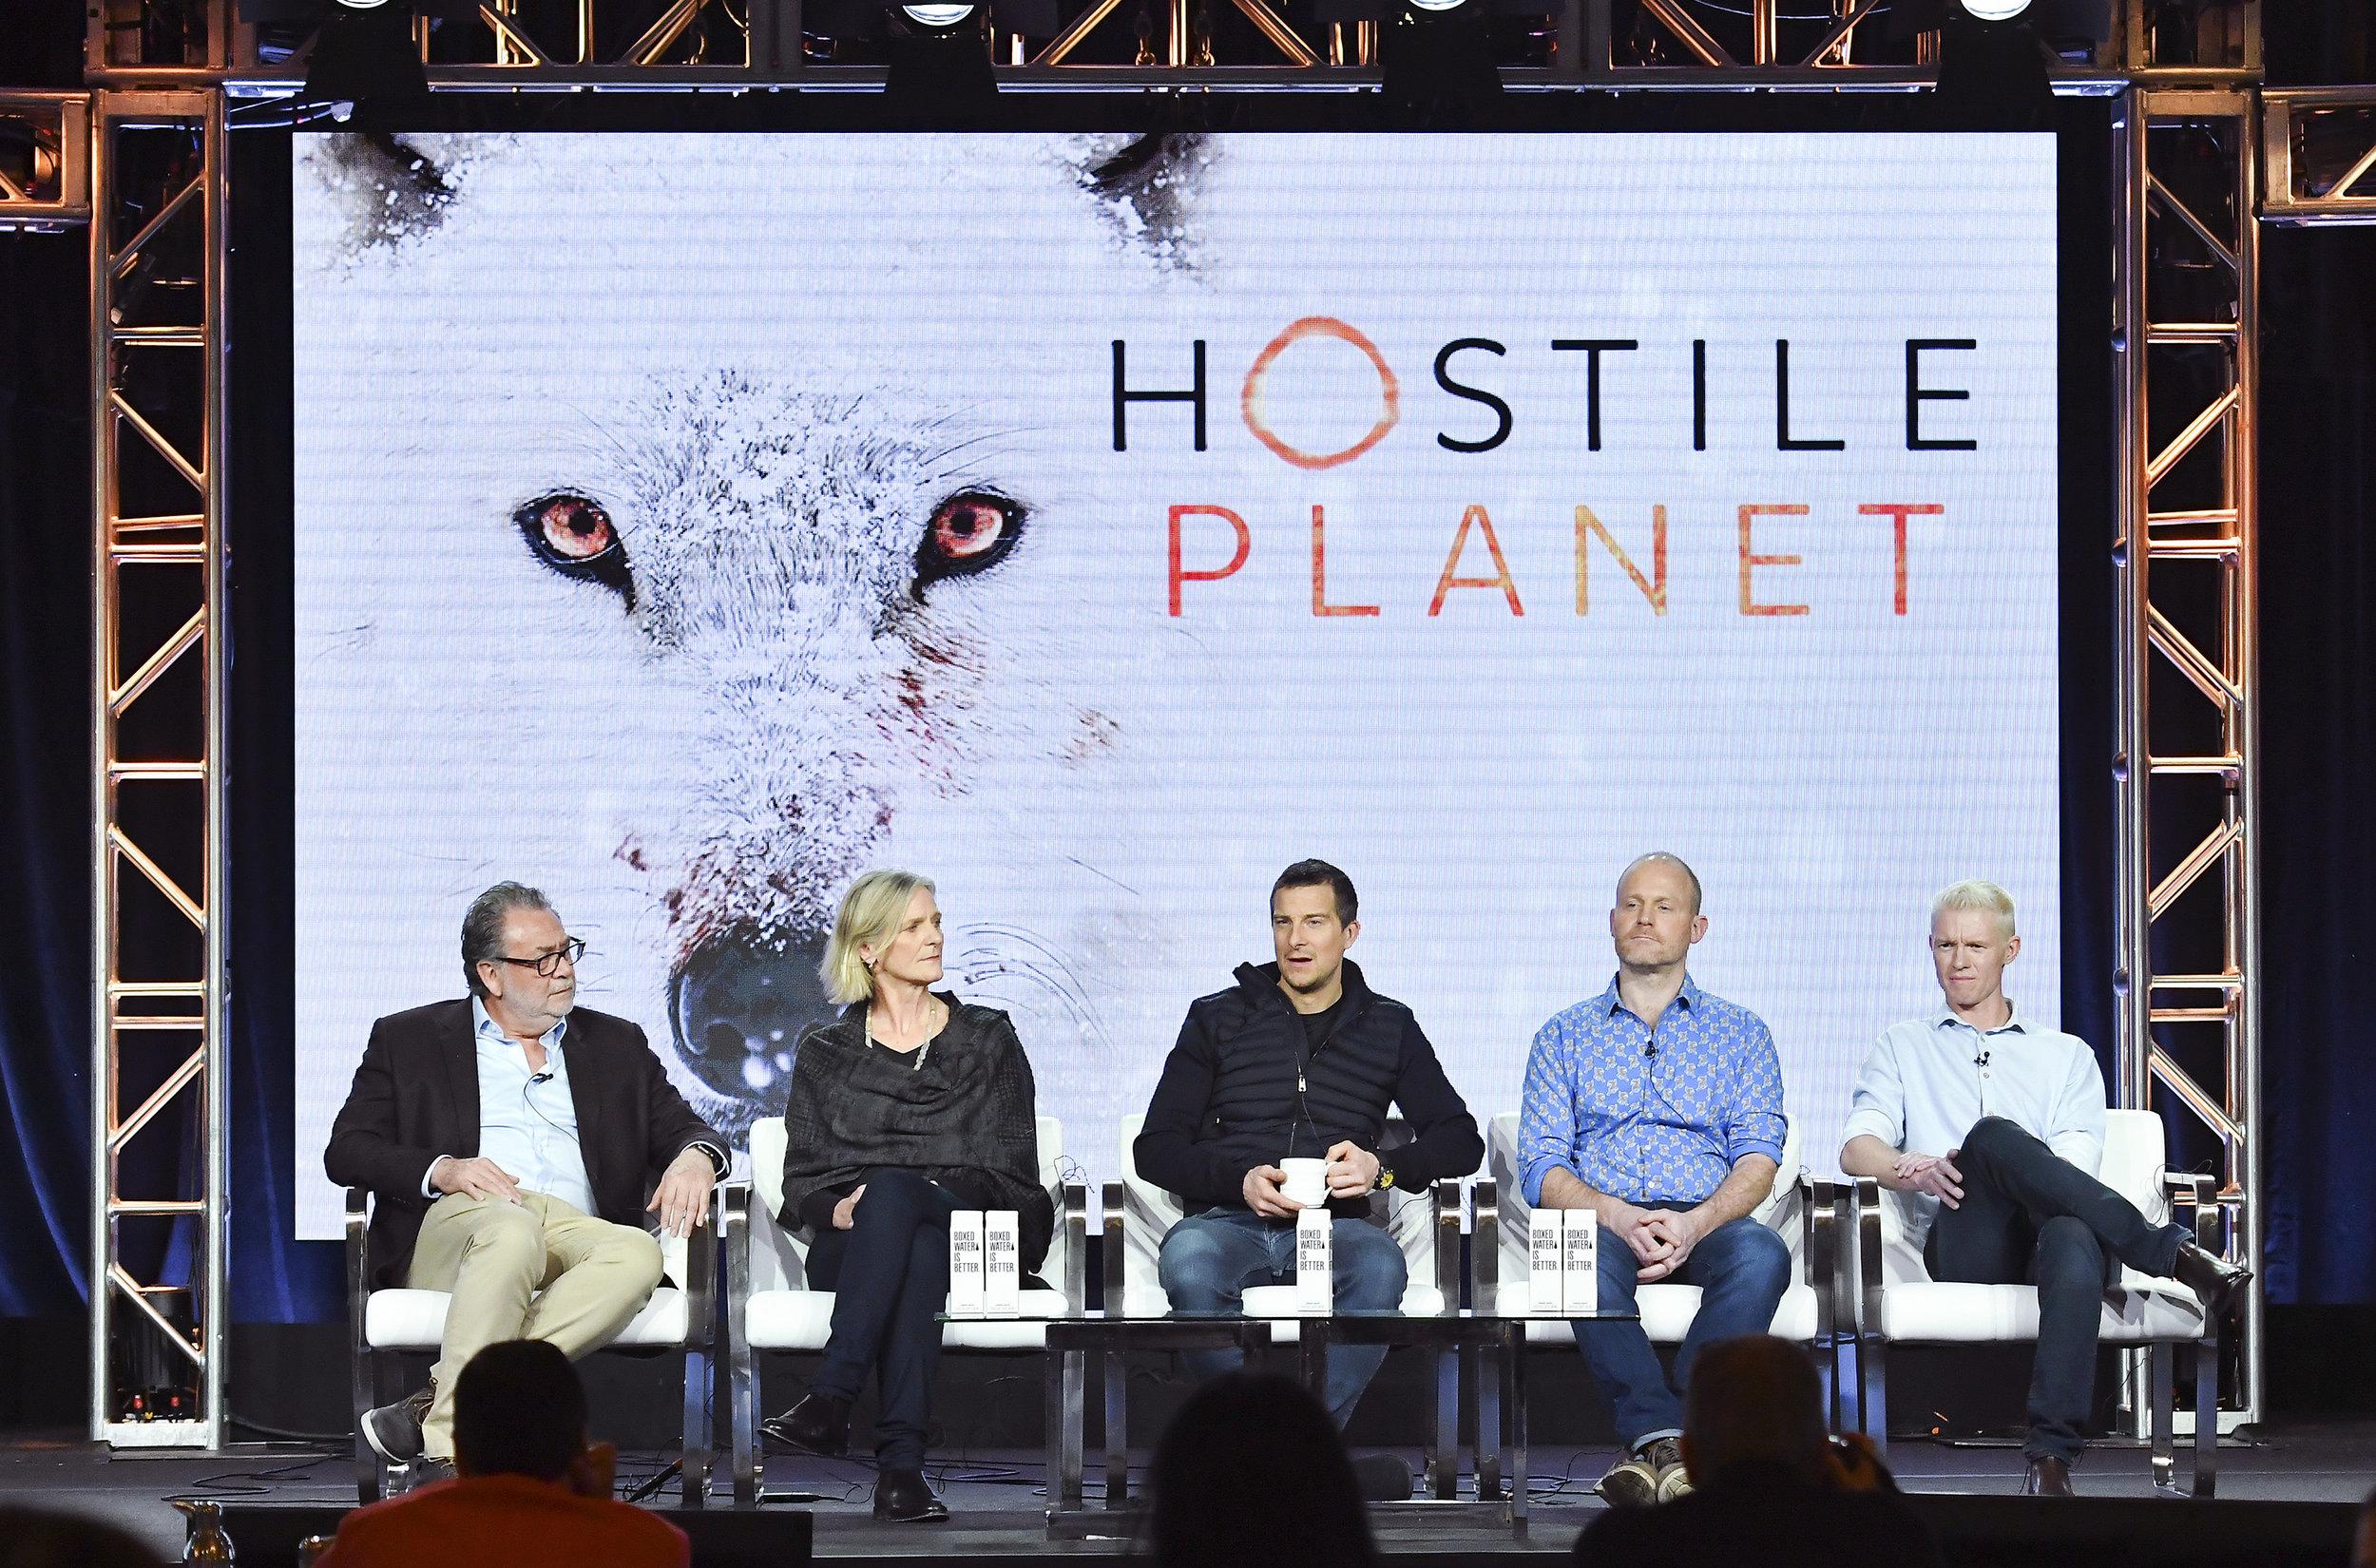 (From Left to Right) Producer: Guillermo Navarro, Producer: Martha Holmes, Host: Bear Grylls, Producer: Tom Hugh-Jones, Director/Cinematographer: Mateo Wilis.